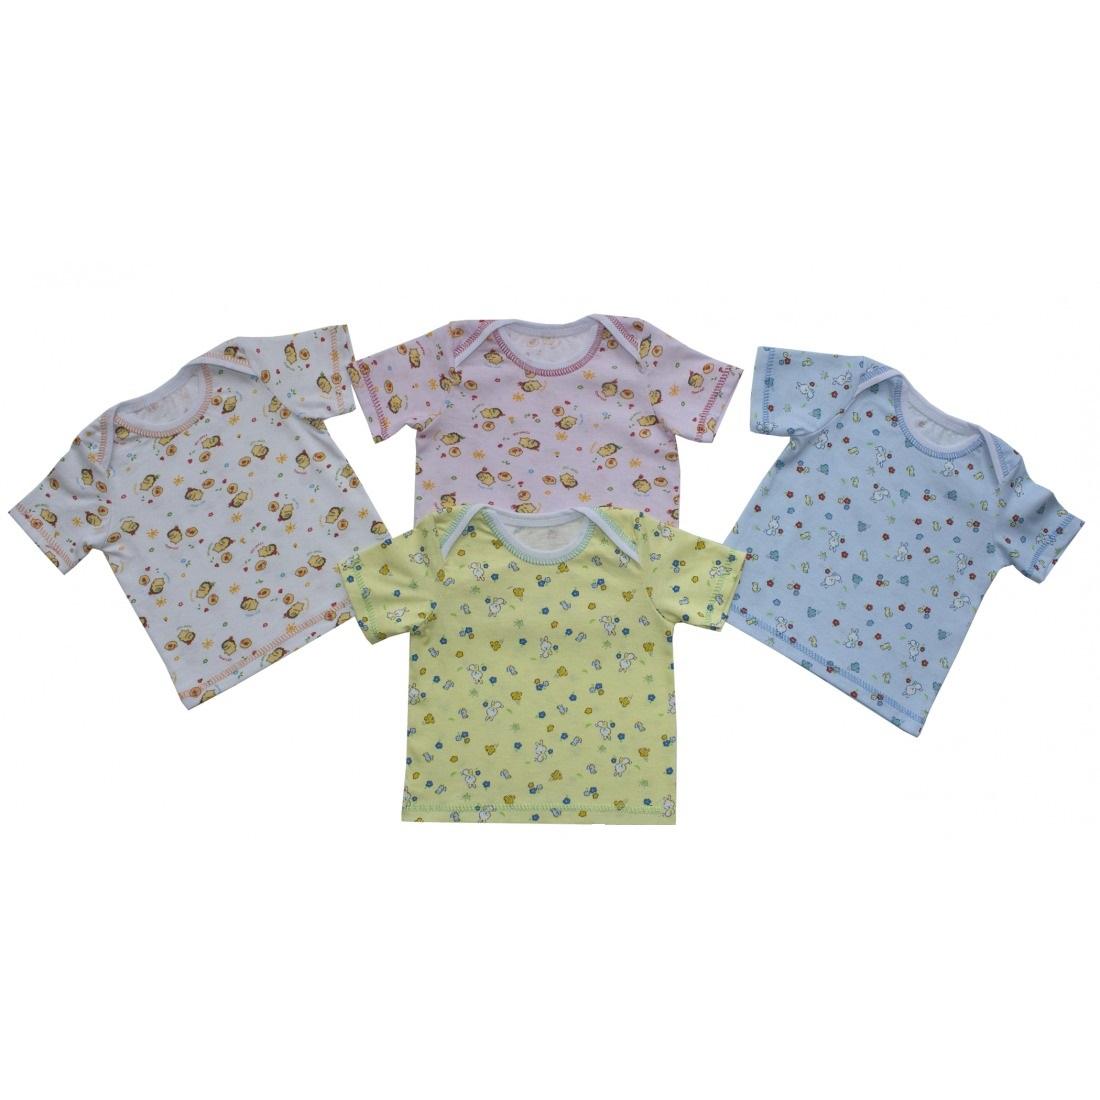 Фуфайка (футболка) детская ТоптыжкаМайки и футболки<br><br><br>Размер: Рост 68 (размер 22)